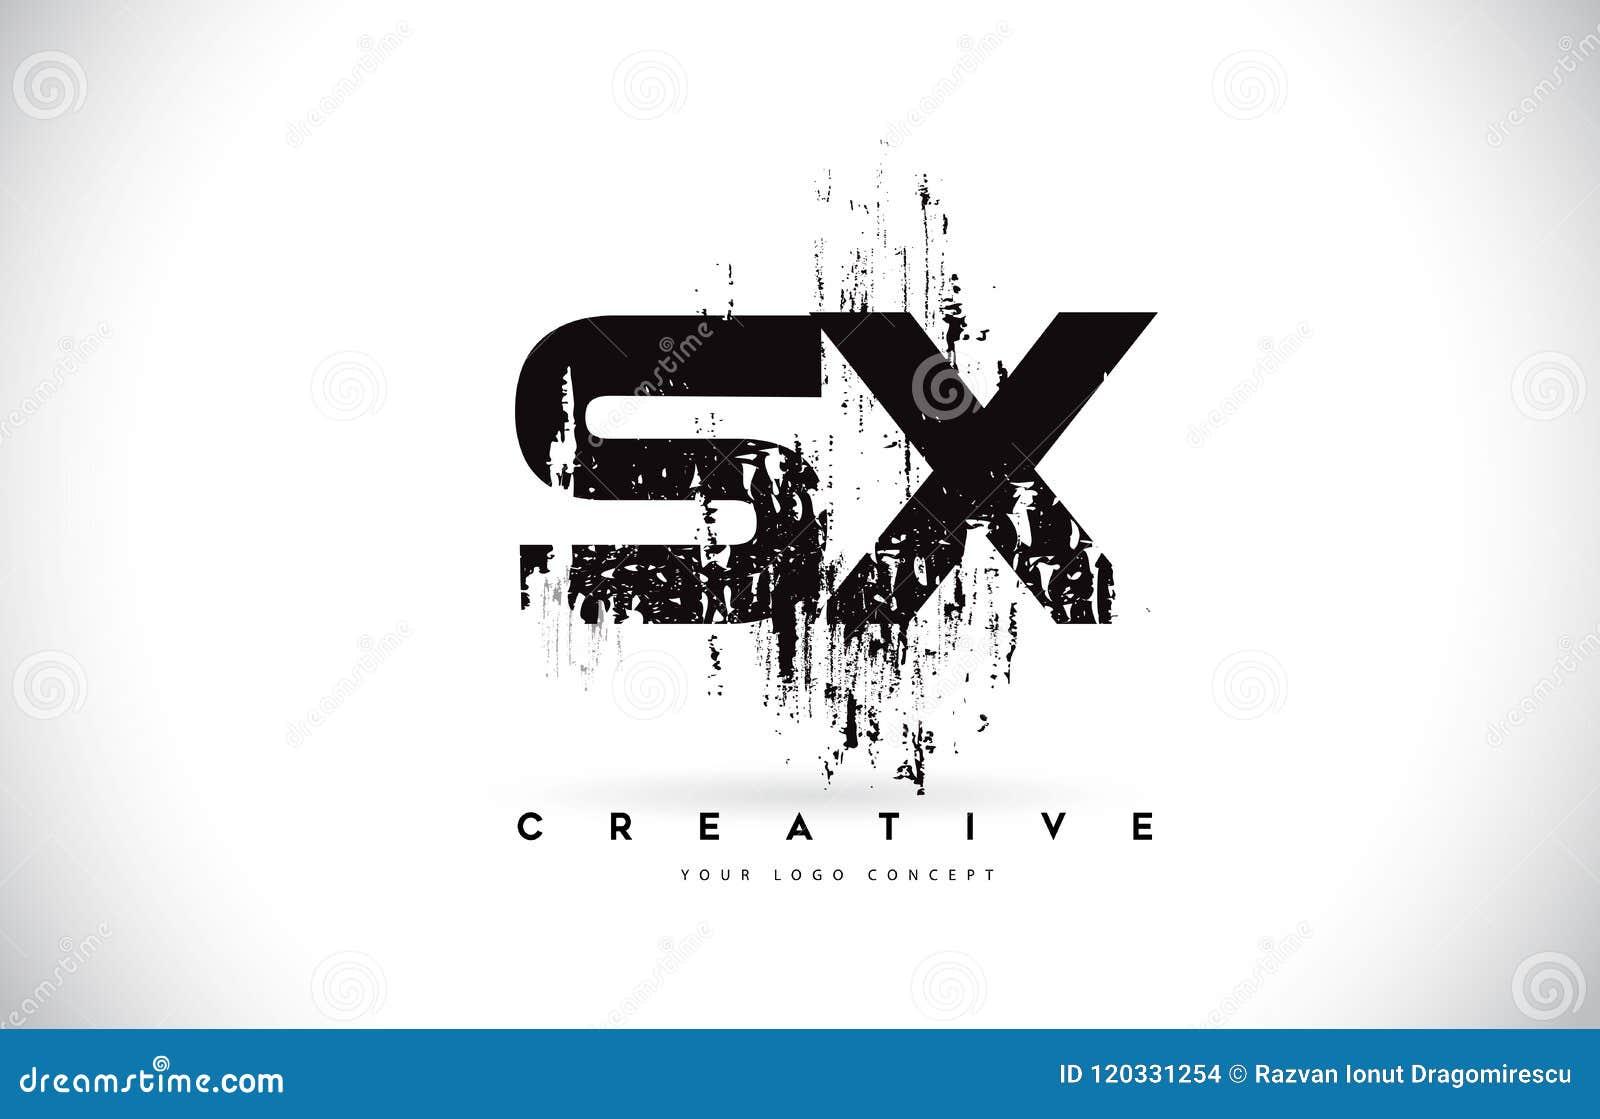 Grunge Camera Vector : Sx s x grunge brush letter logo design in black colors vector il